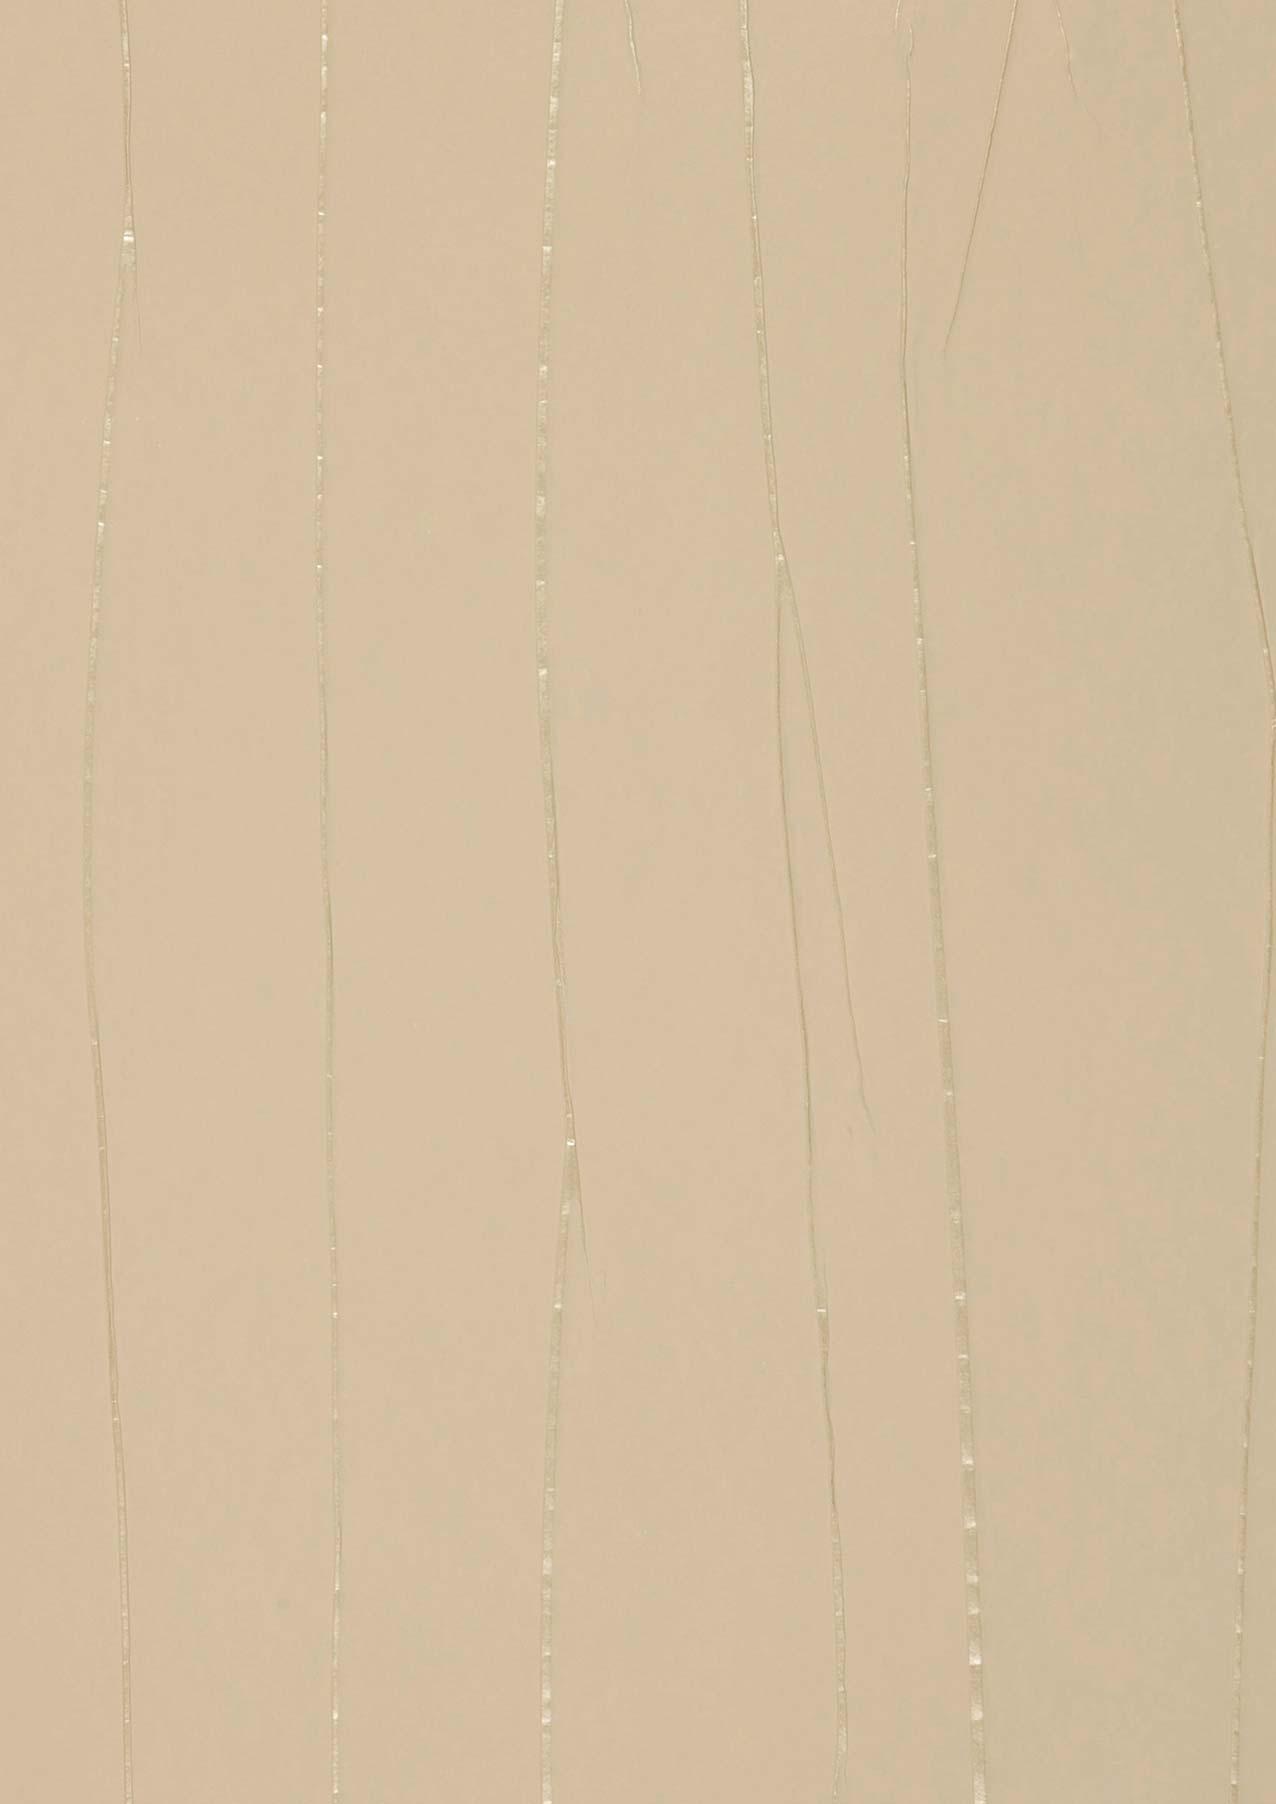 Papel pintado crush luxor 01 marfil beige papeles de - Papel pintado de los 70 ...